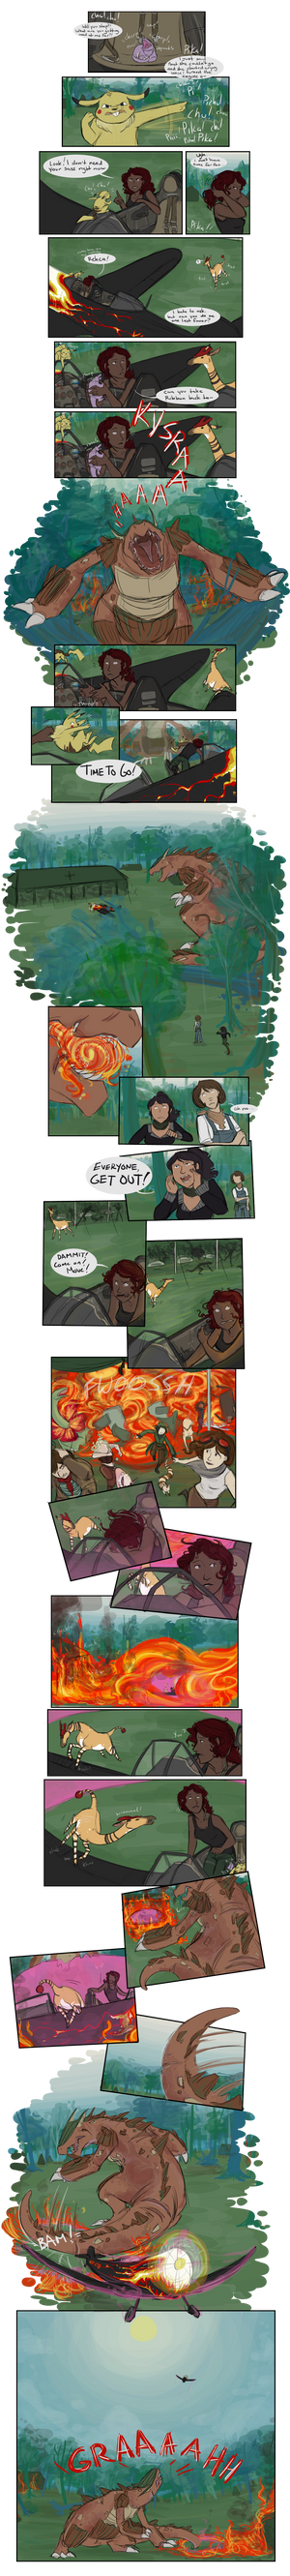 End Run Round 6: Page 5